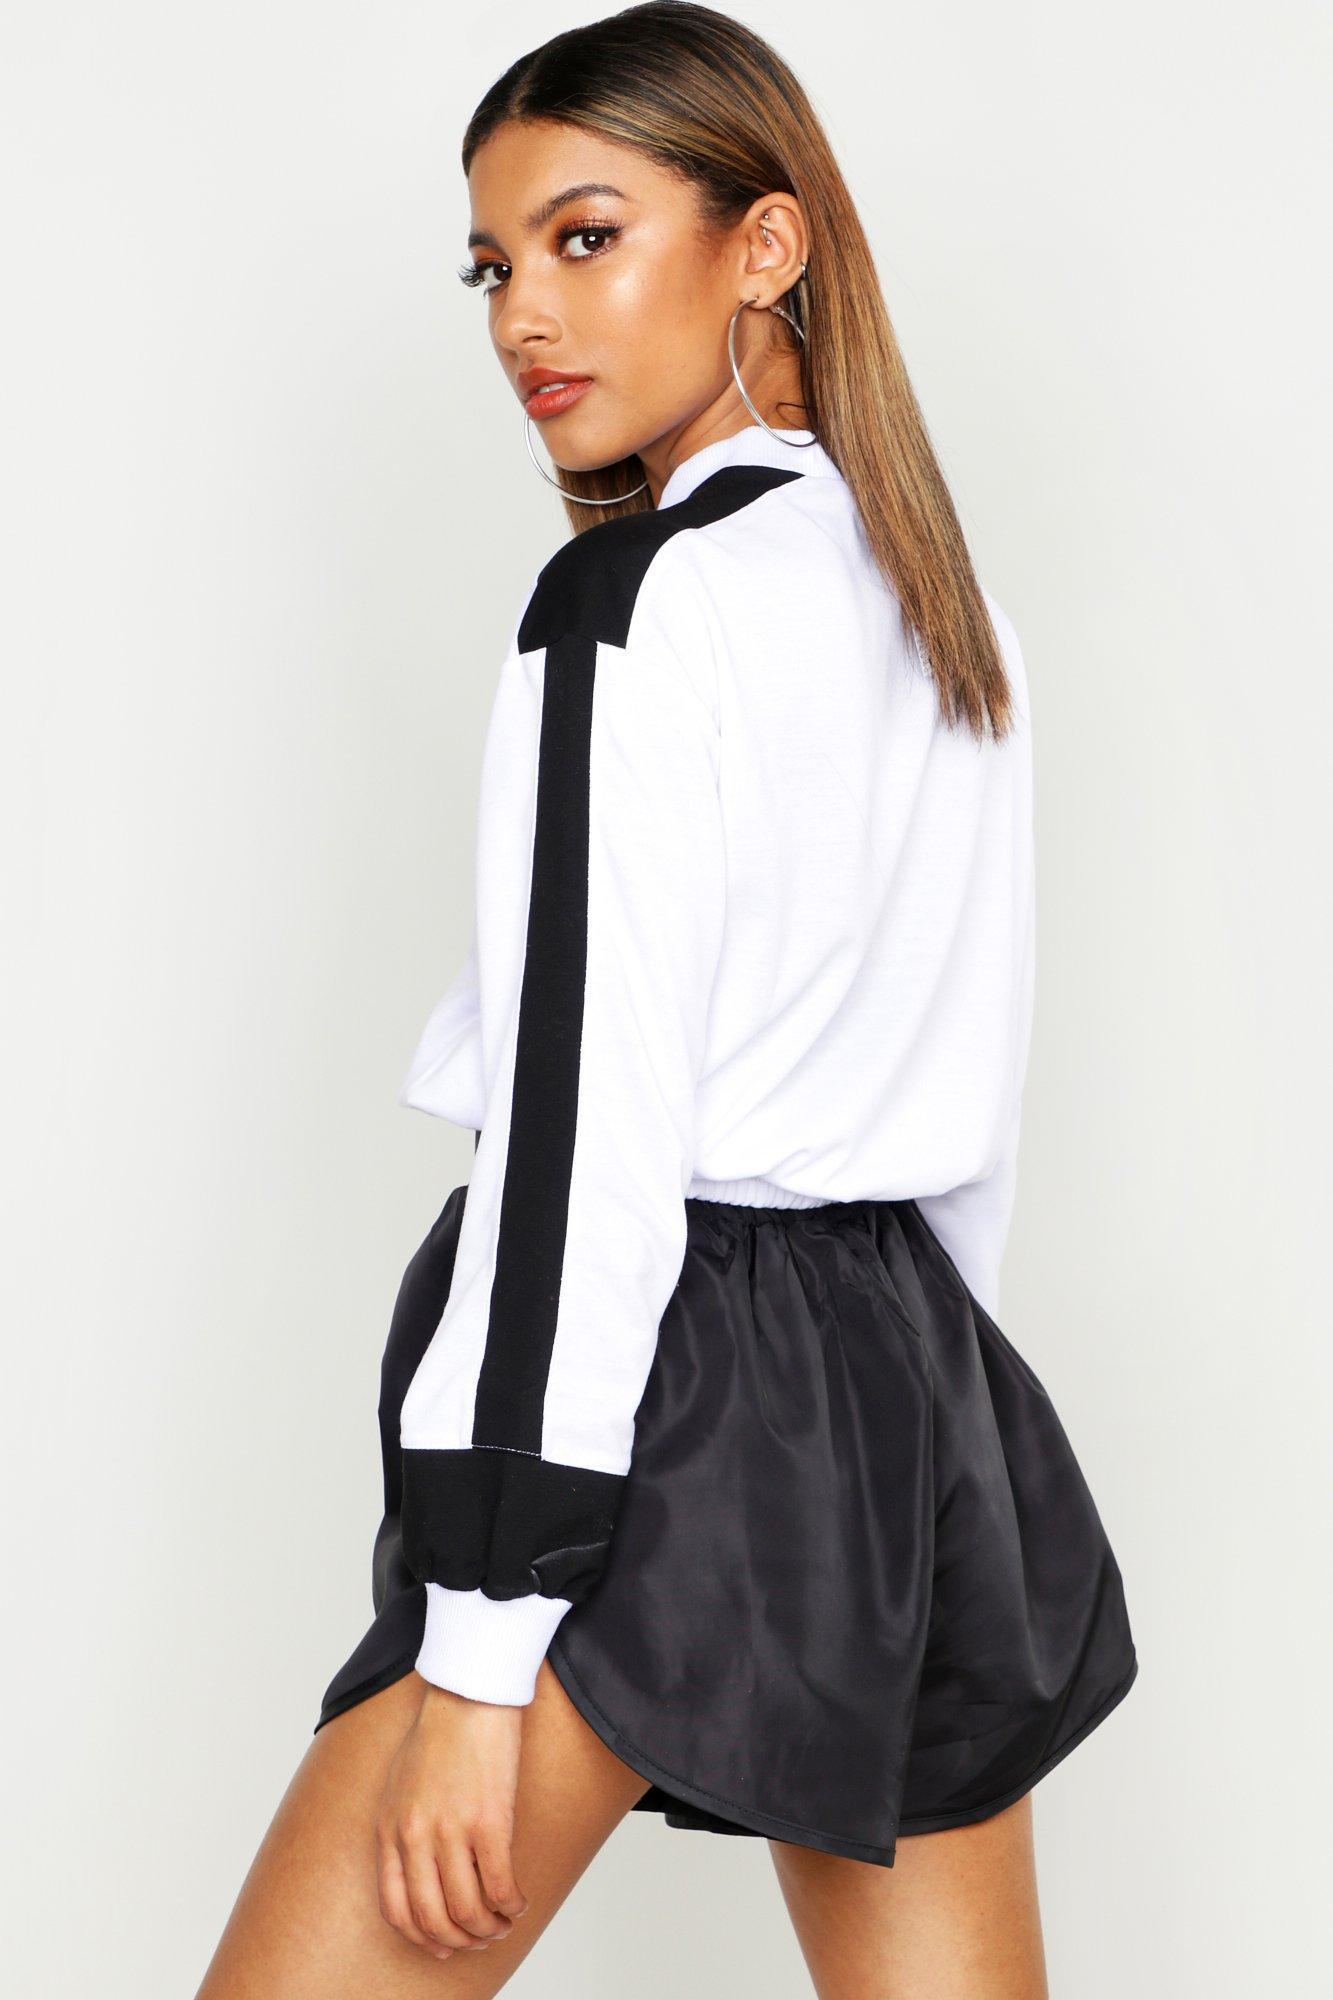 Womens Colorblock-Sweatshirt - Weiß - 36, Weiß - Boohoo.com